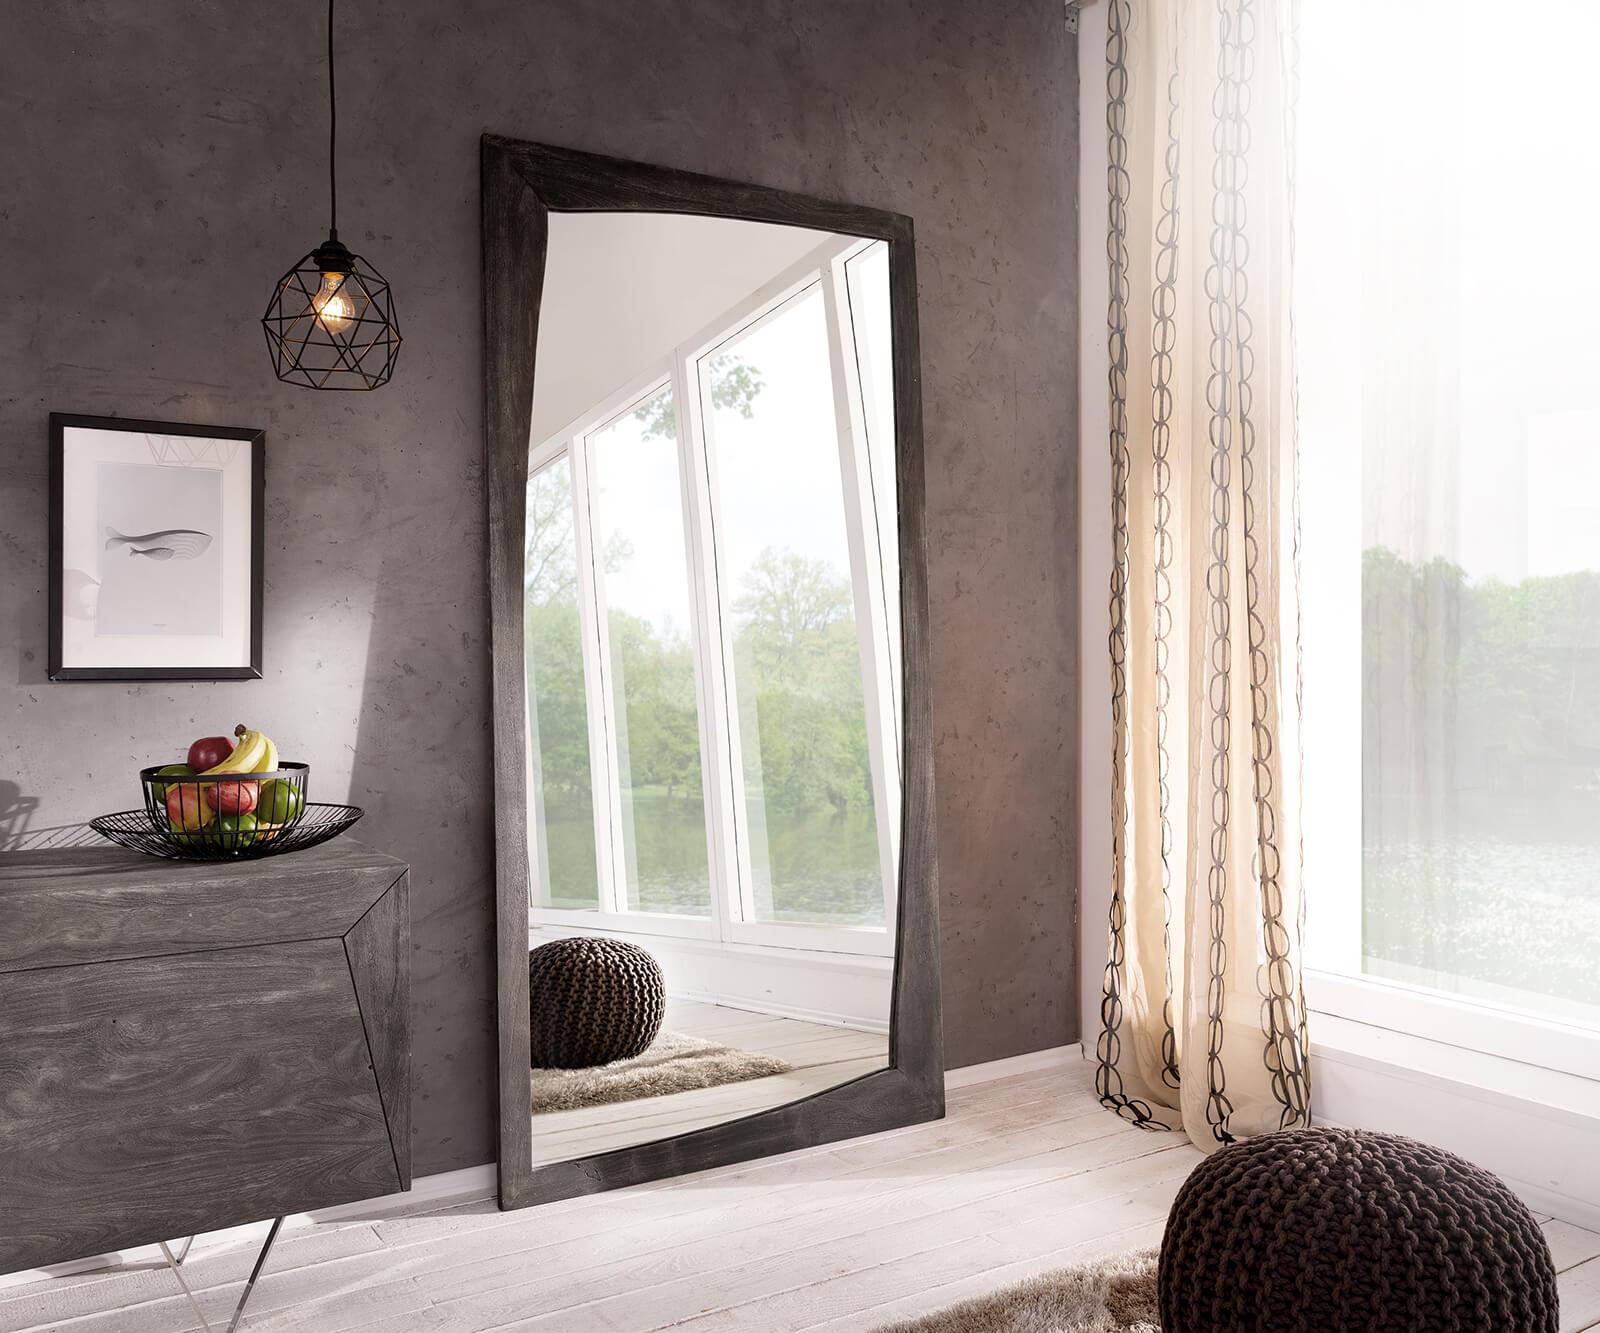 design wandspiegel wyatt 200x100 cm akazie platin m bel. Black Bedroom Furniture Sets. Home Design Ideas